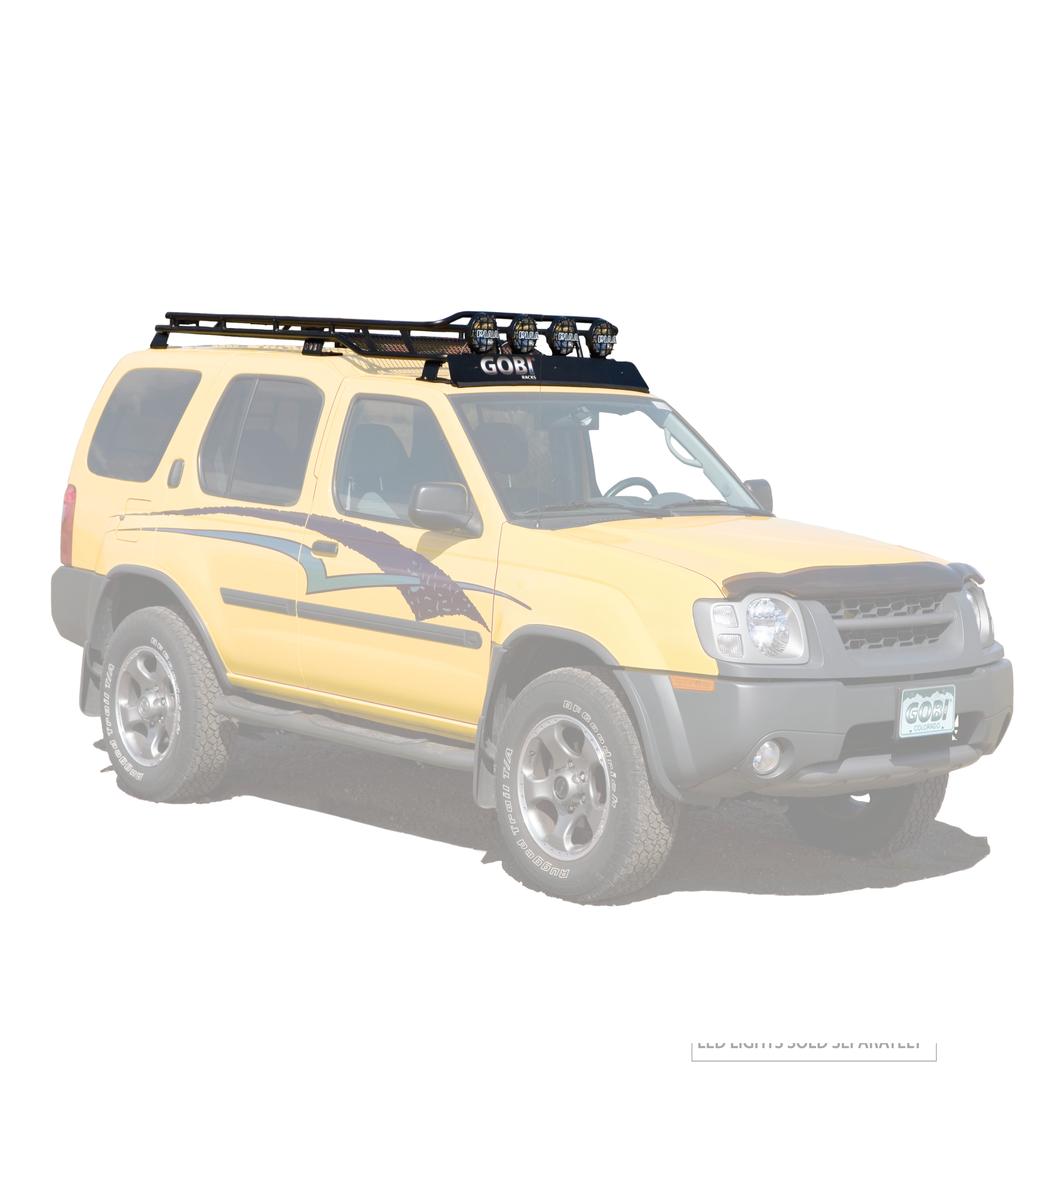 GOBI Nissan Xterra (00-04) Stealth Rack. Webp.net-resizeimage-614